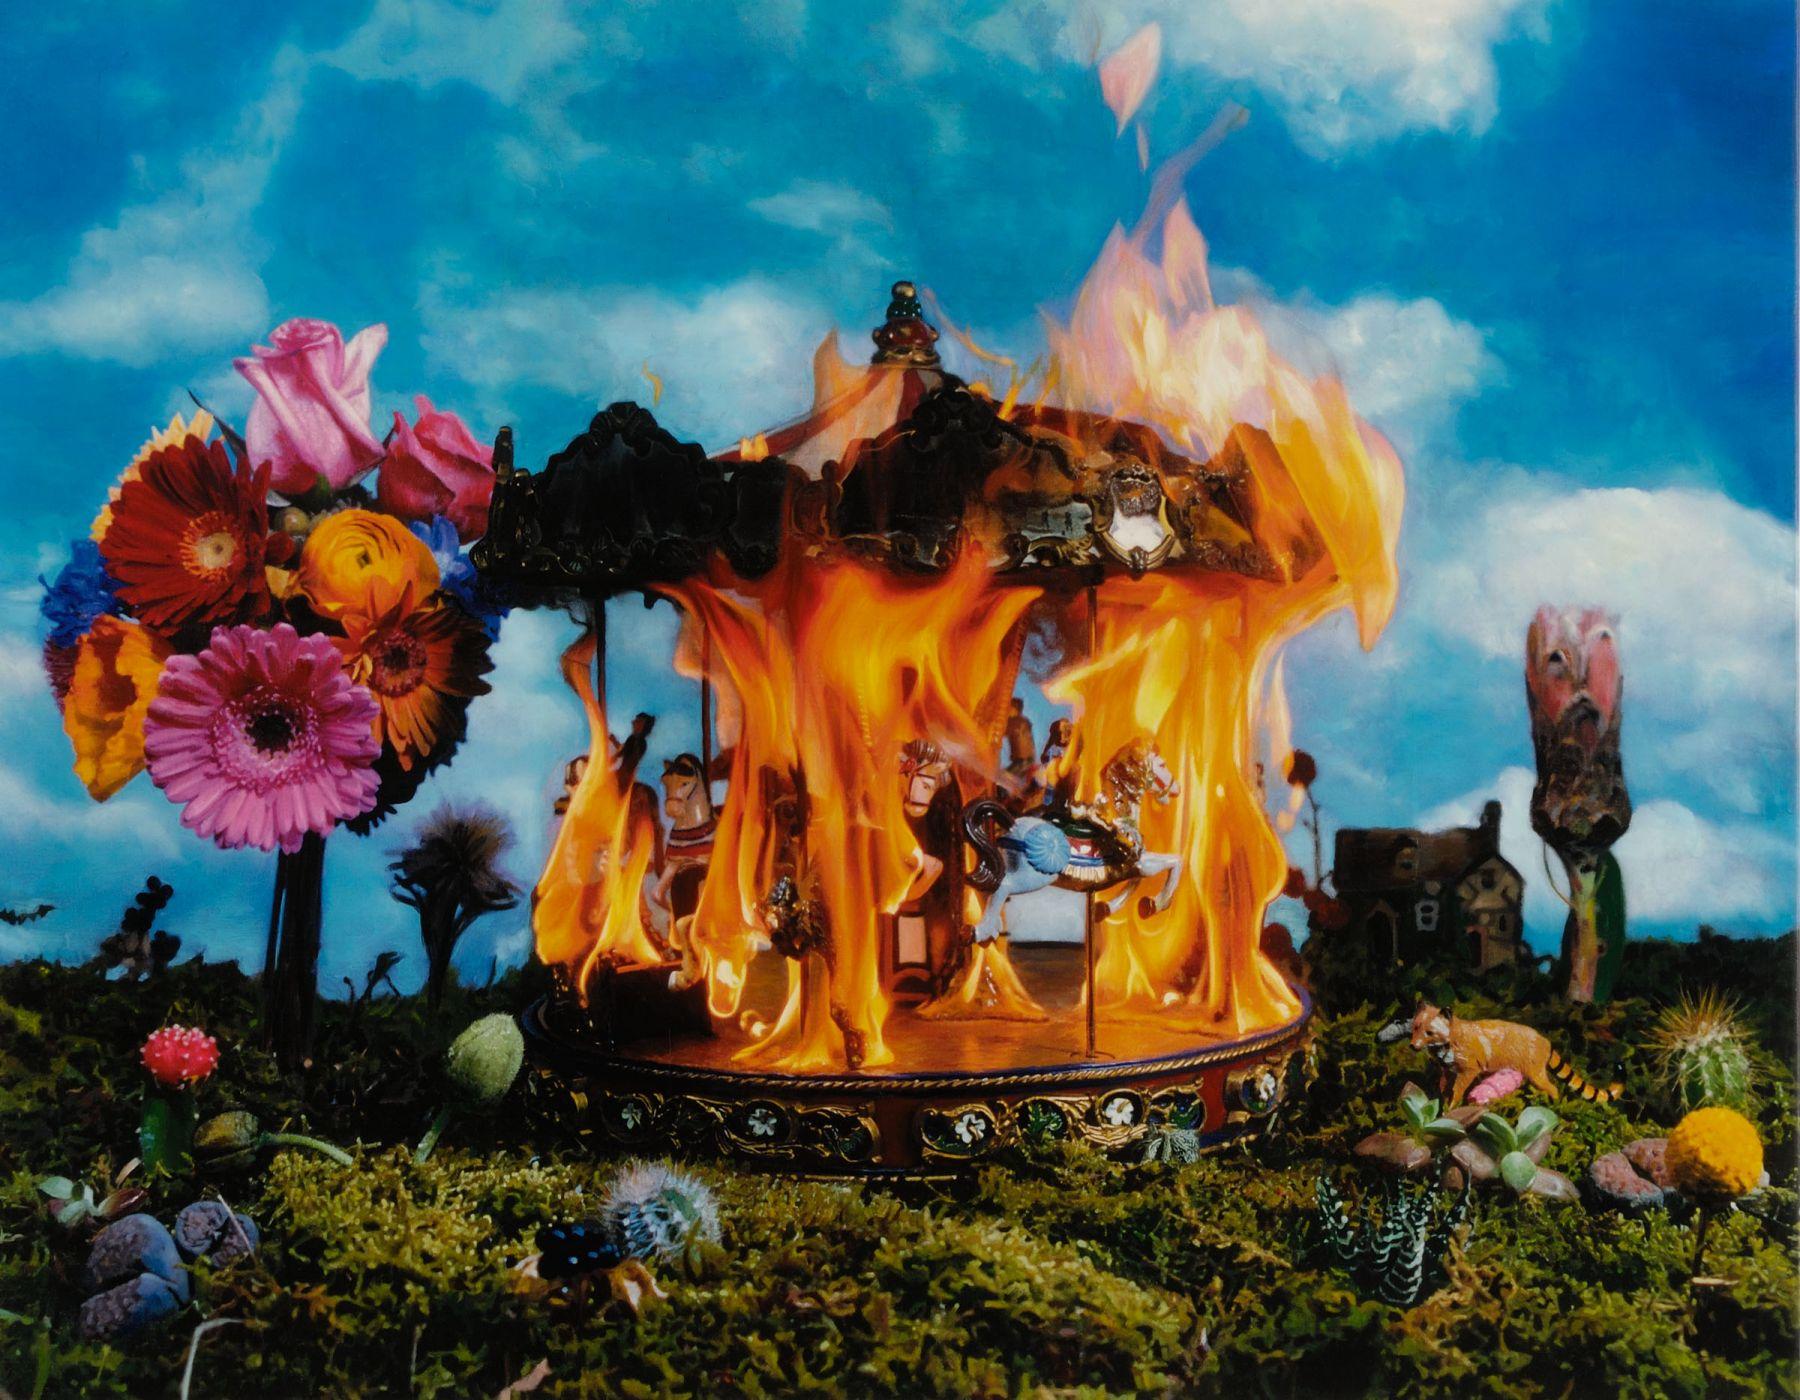 flaming flower structure by tetsutaro kamatani